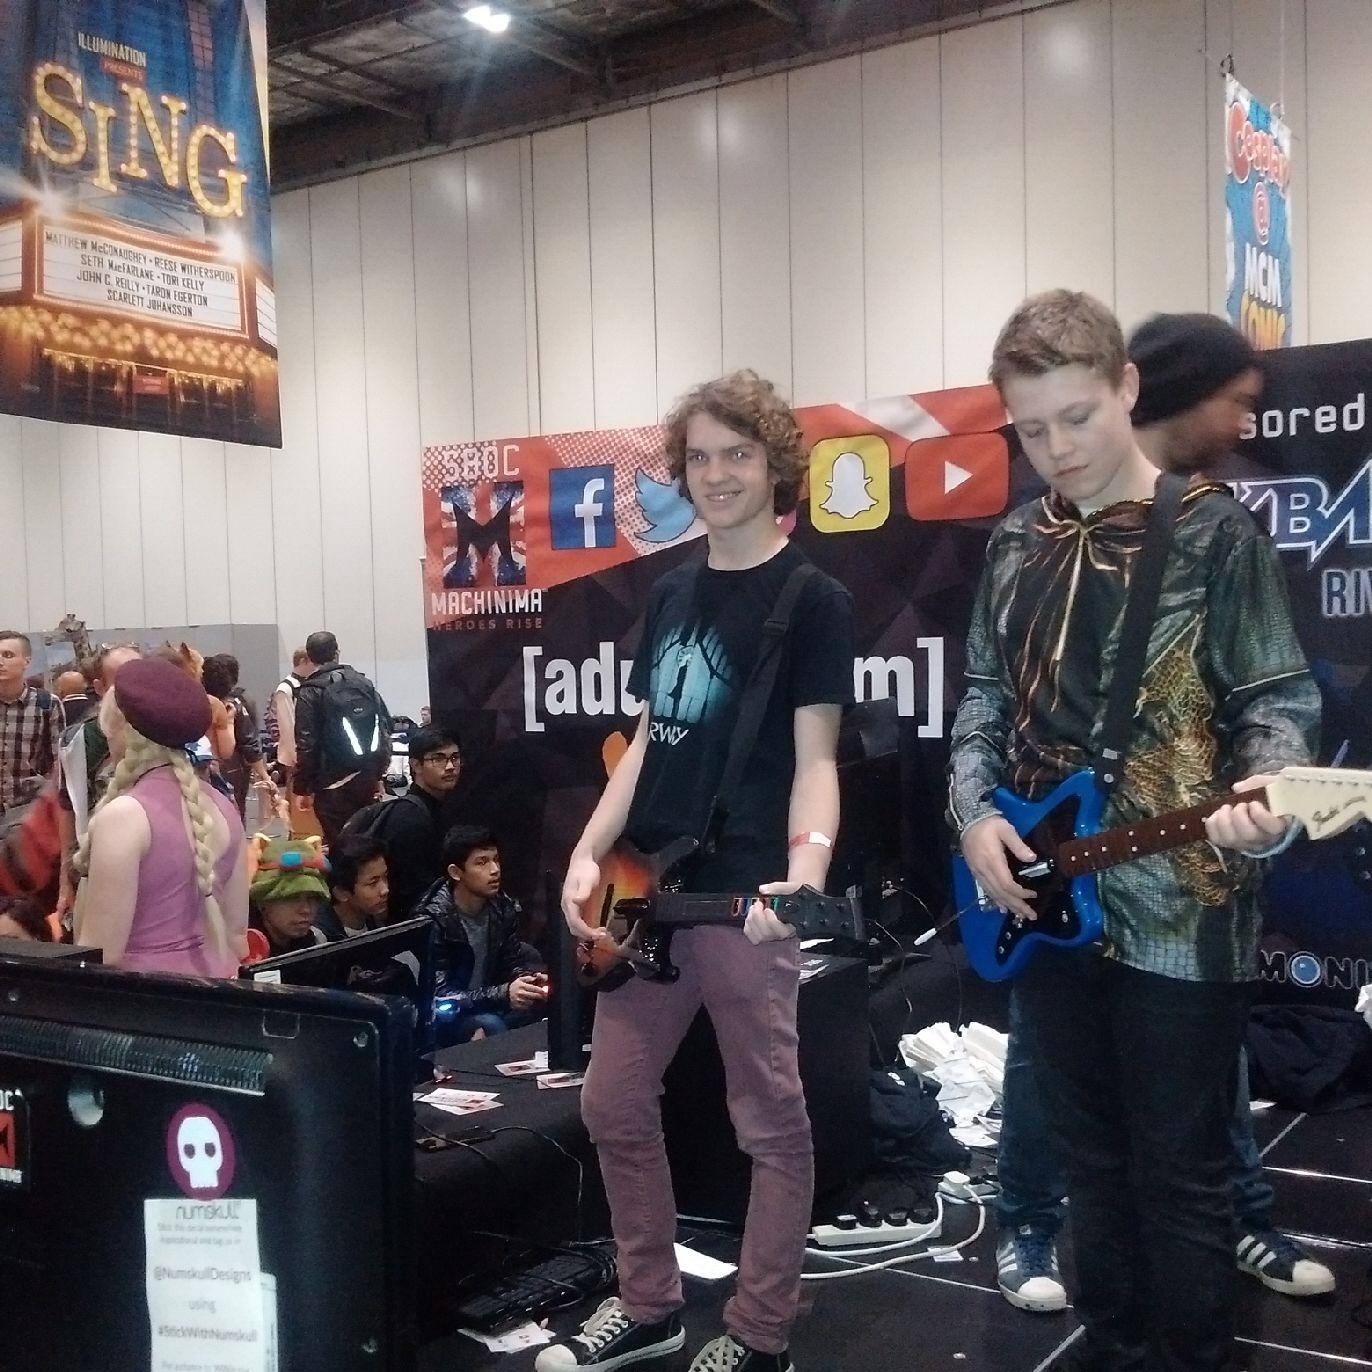 MCM Comic Con London 2016